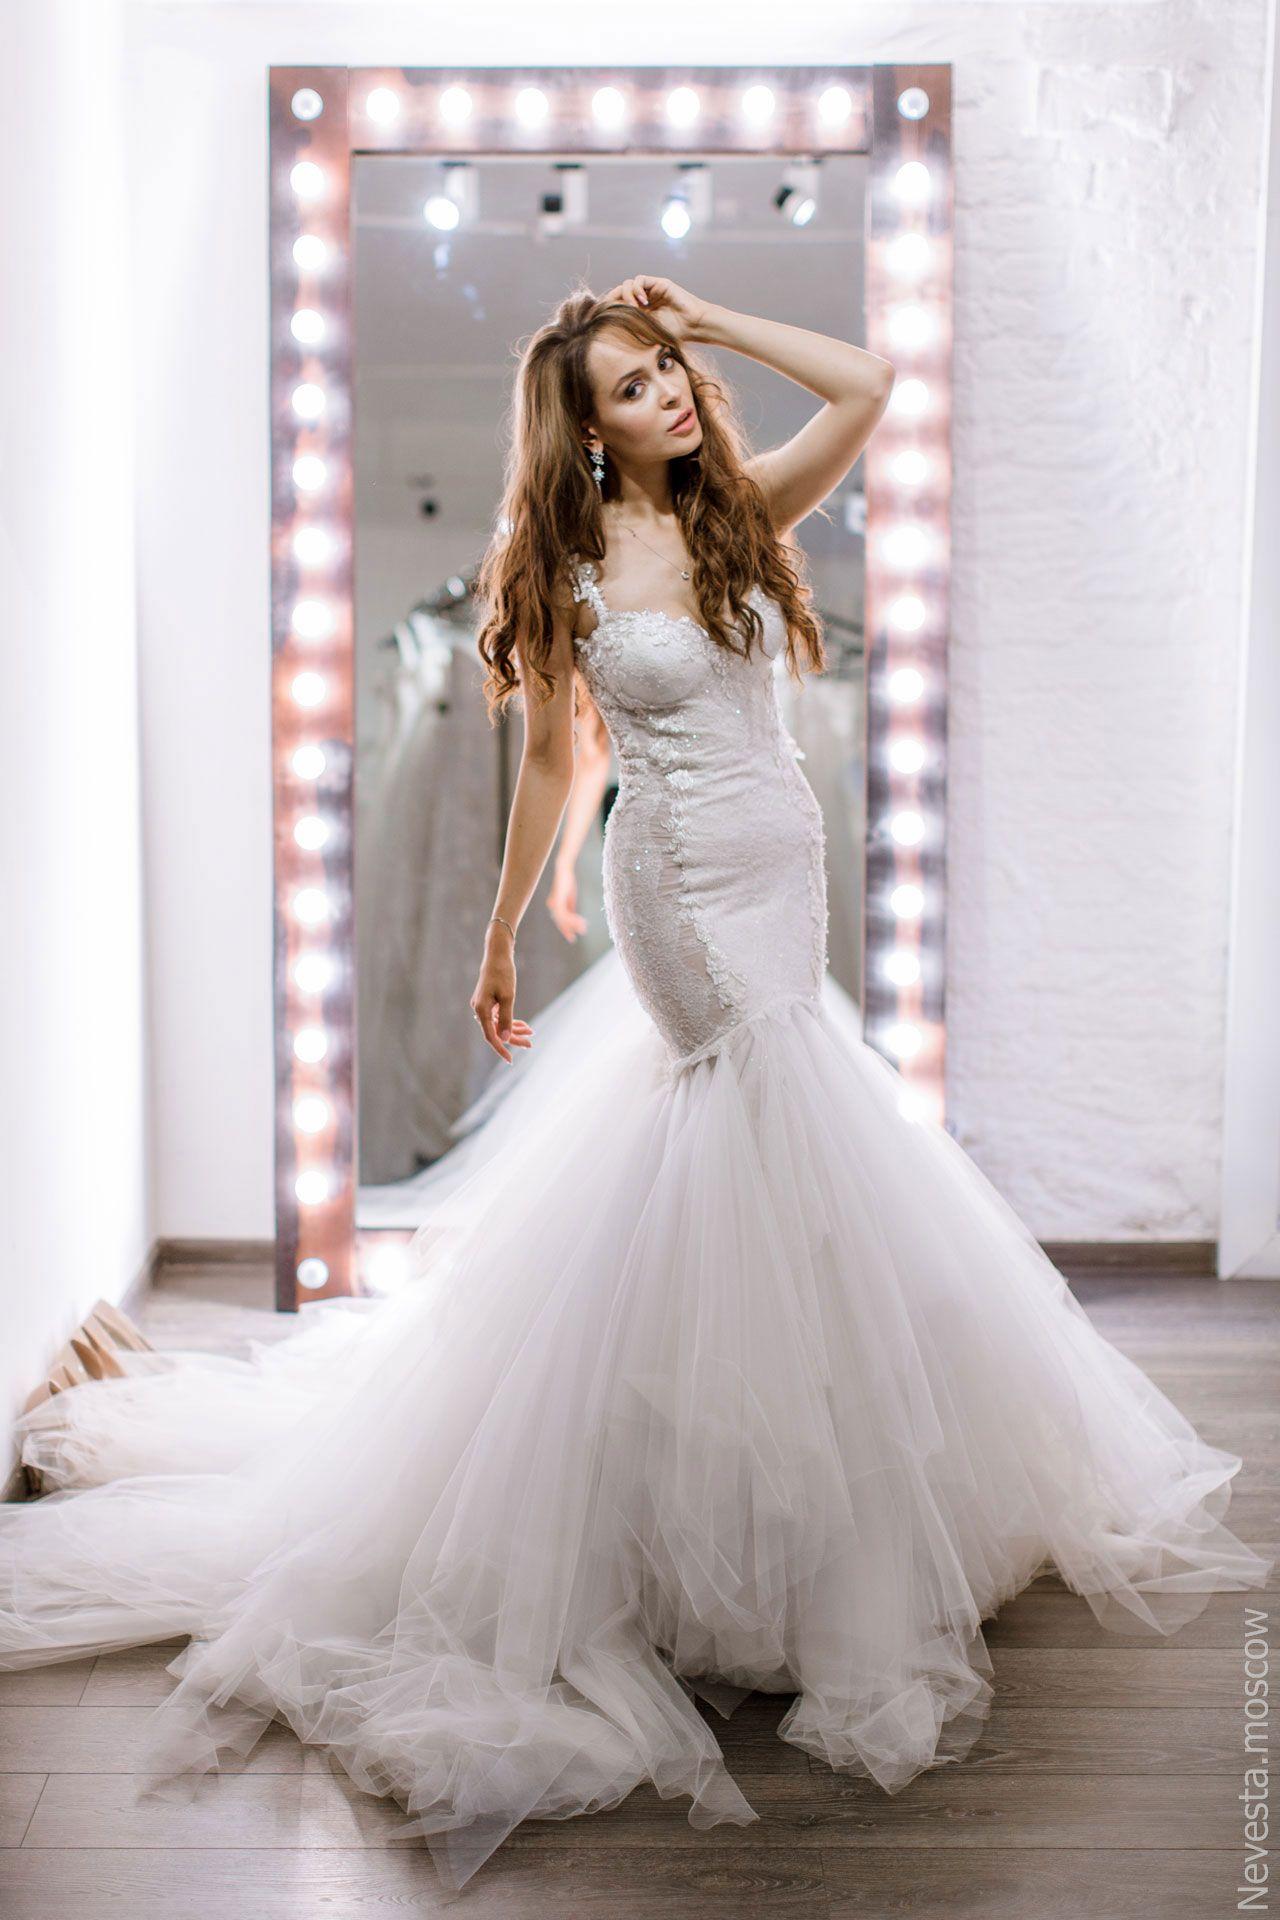 Актриса Анна Калашникова в образе белого лебедя фото 24